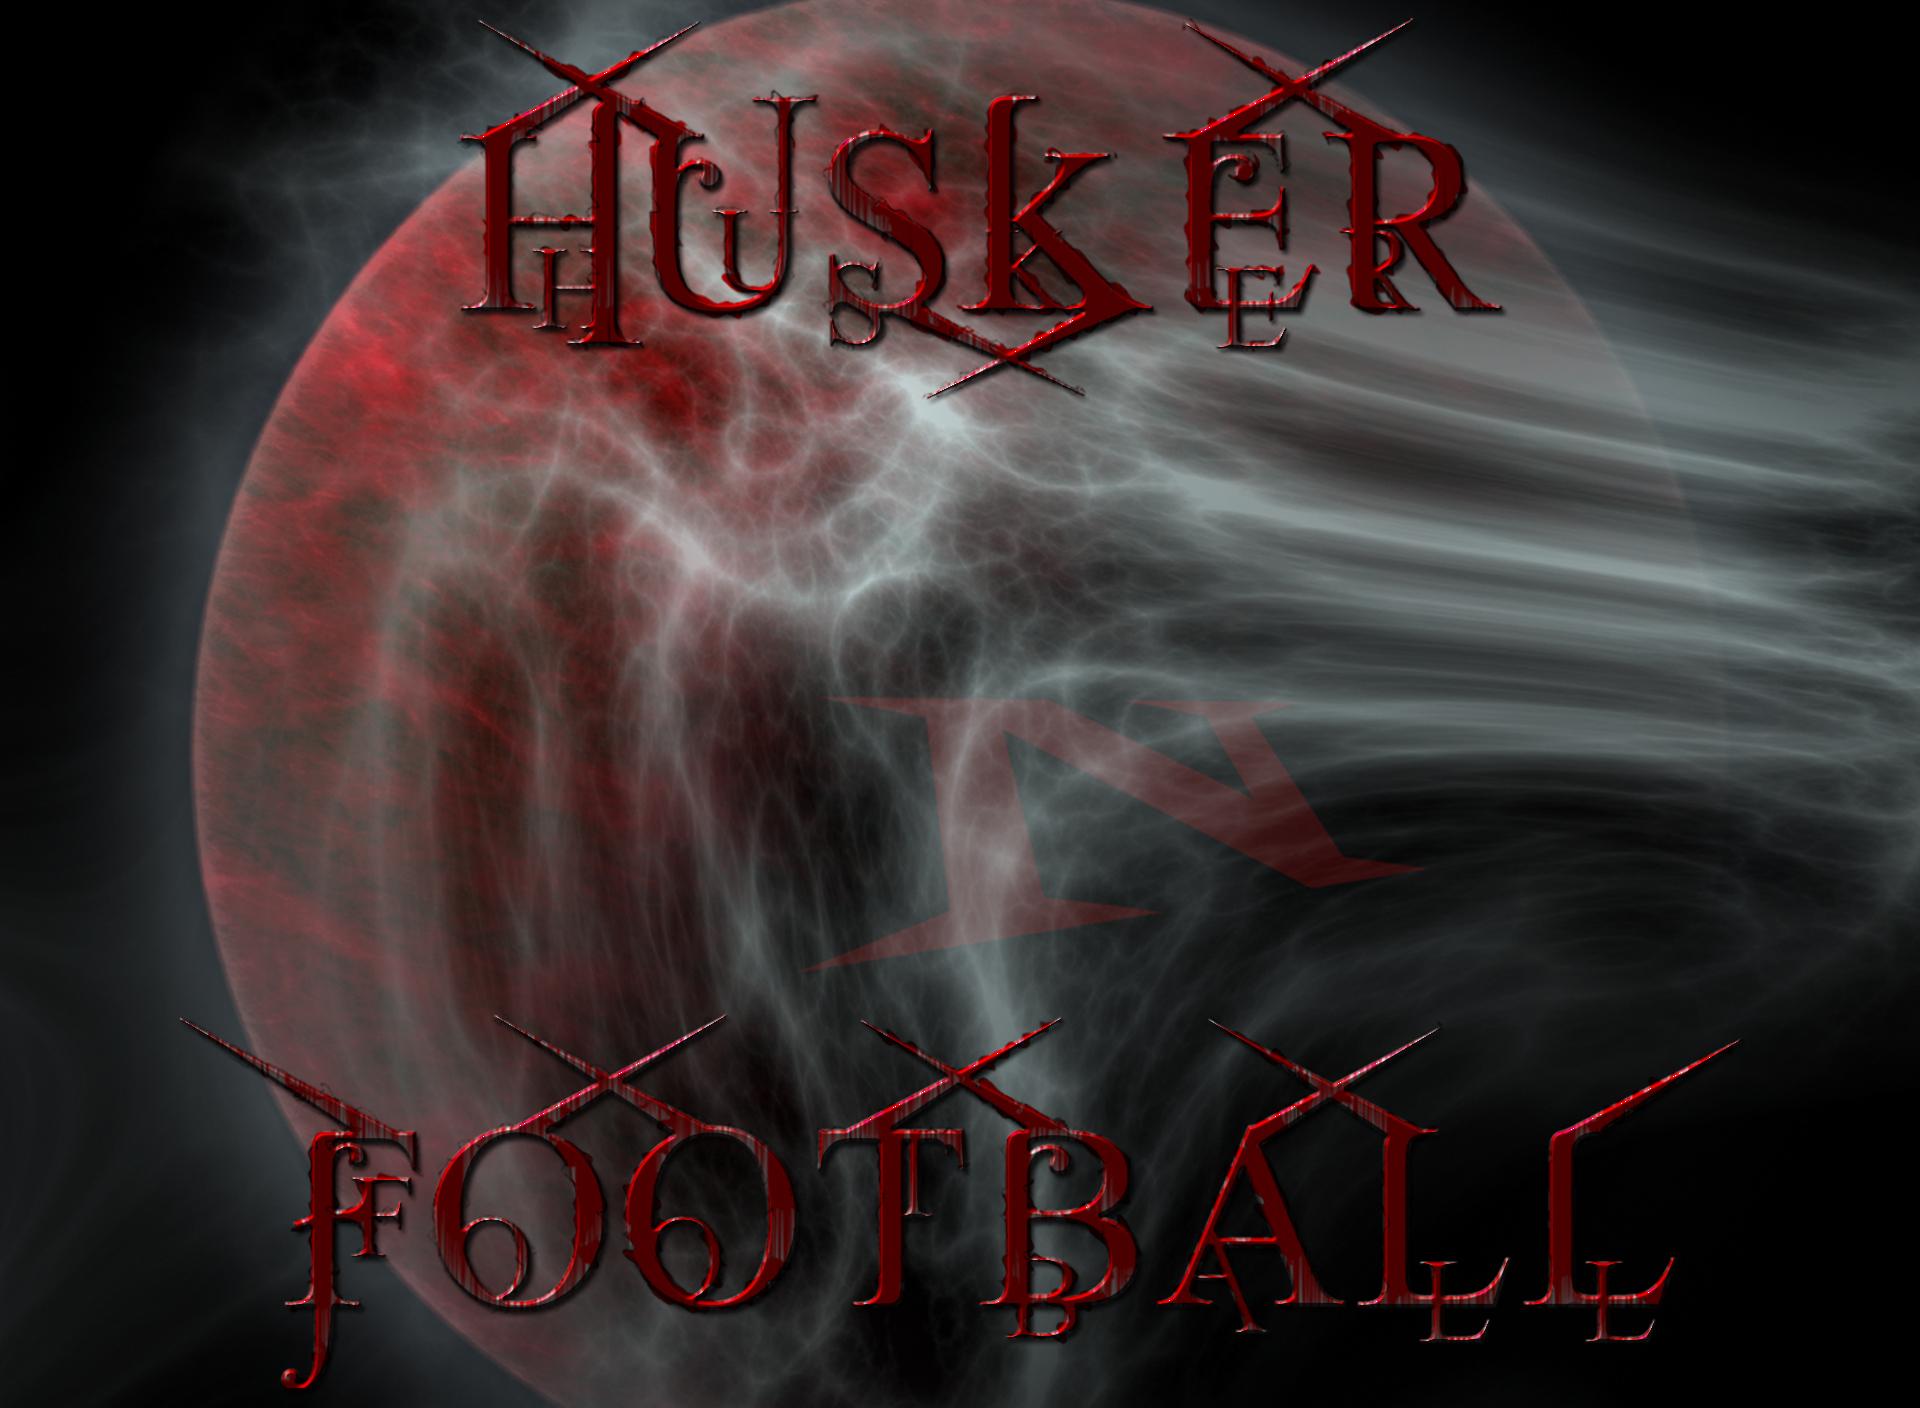 husker football blood moon wallpaper free download